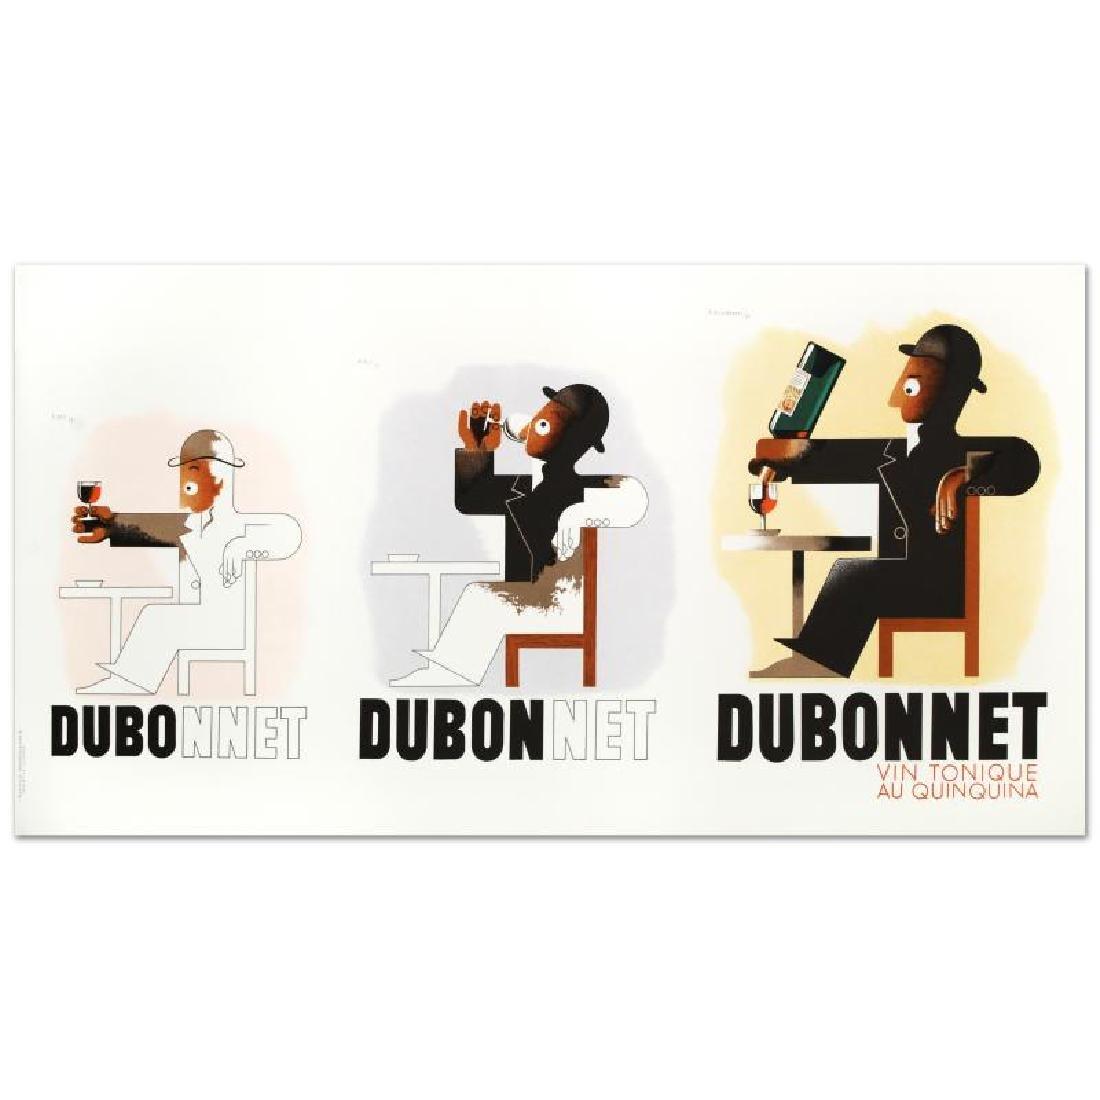 Dubo Dubon Dubonnet by RE Society